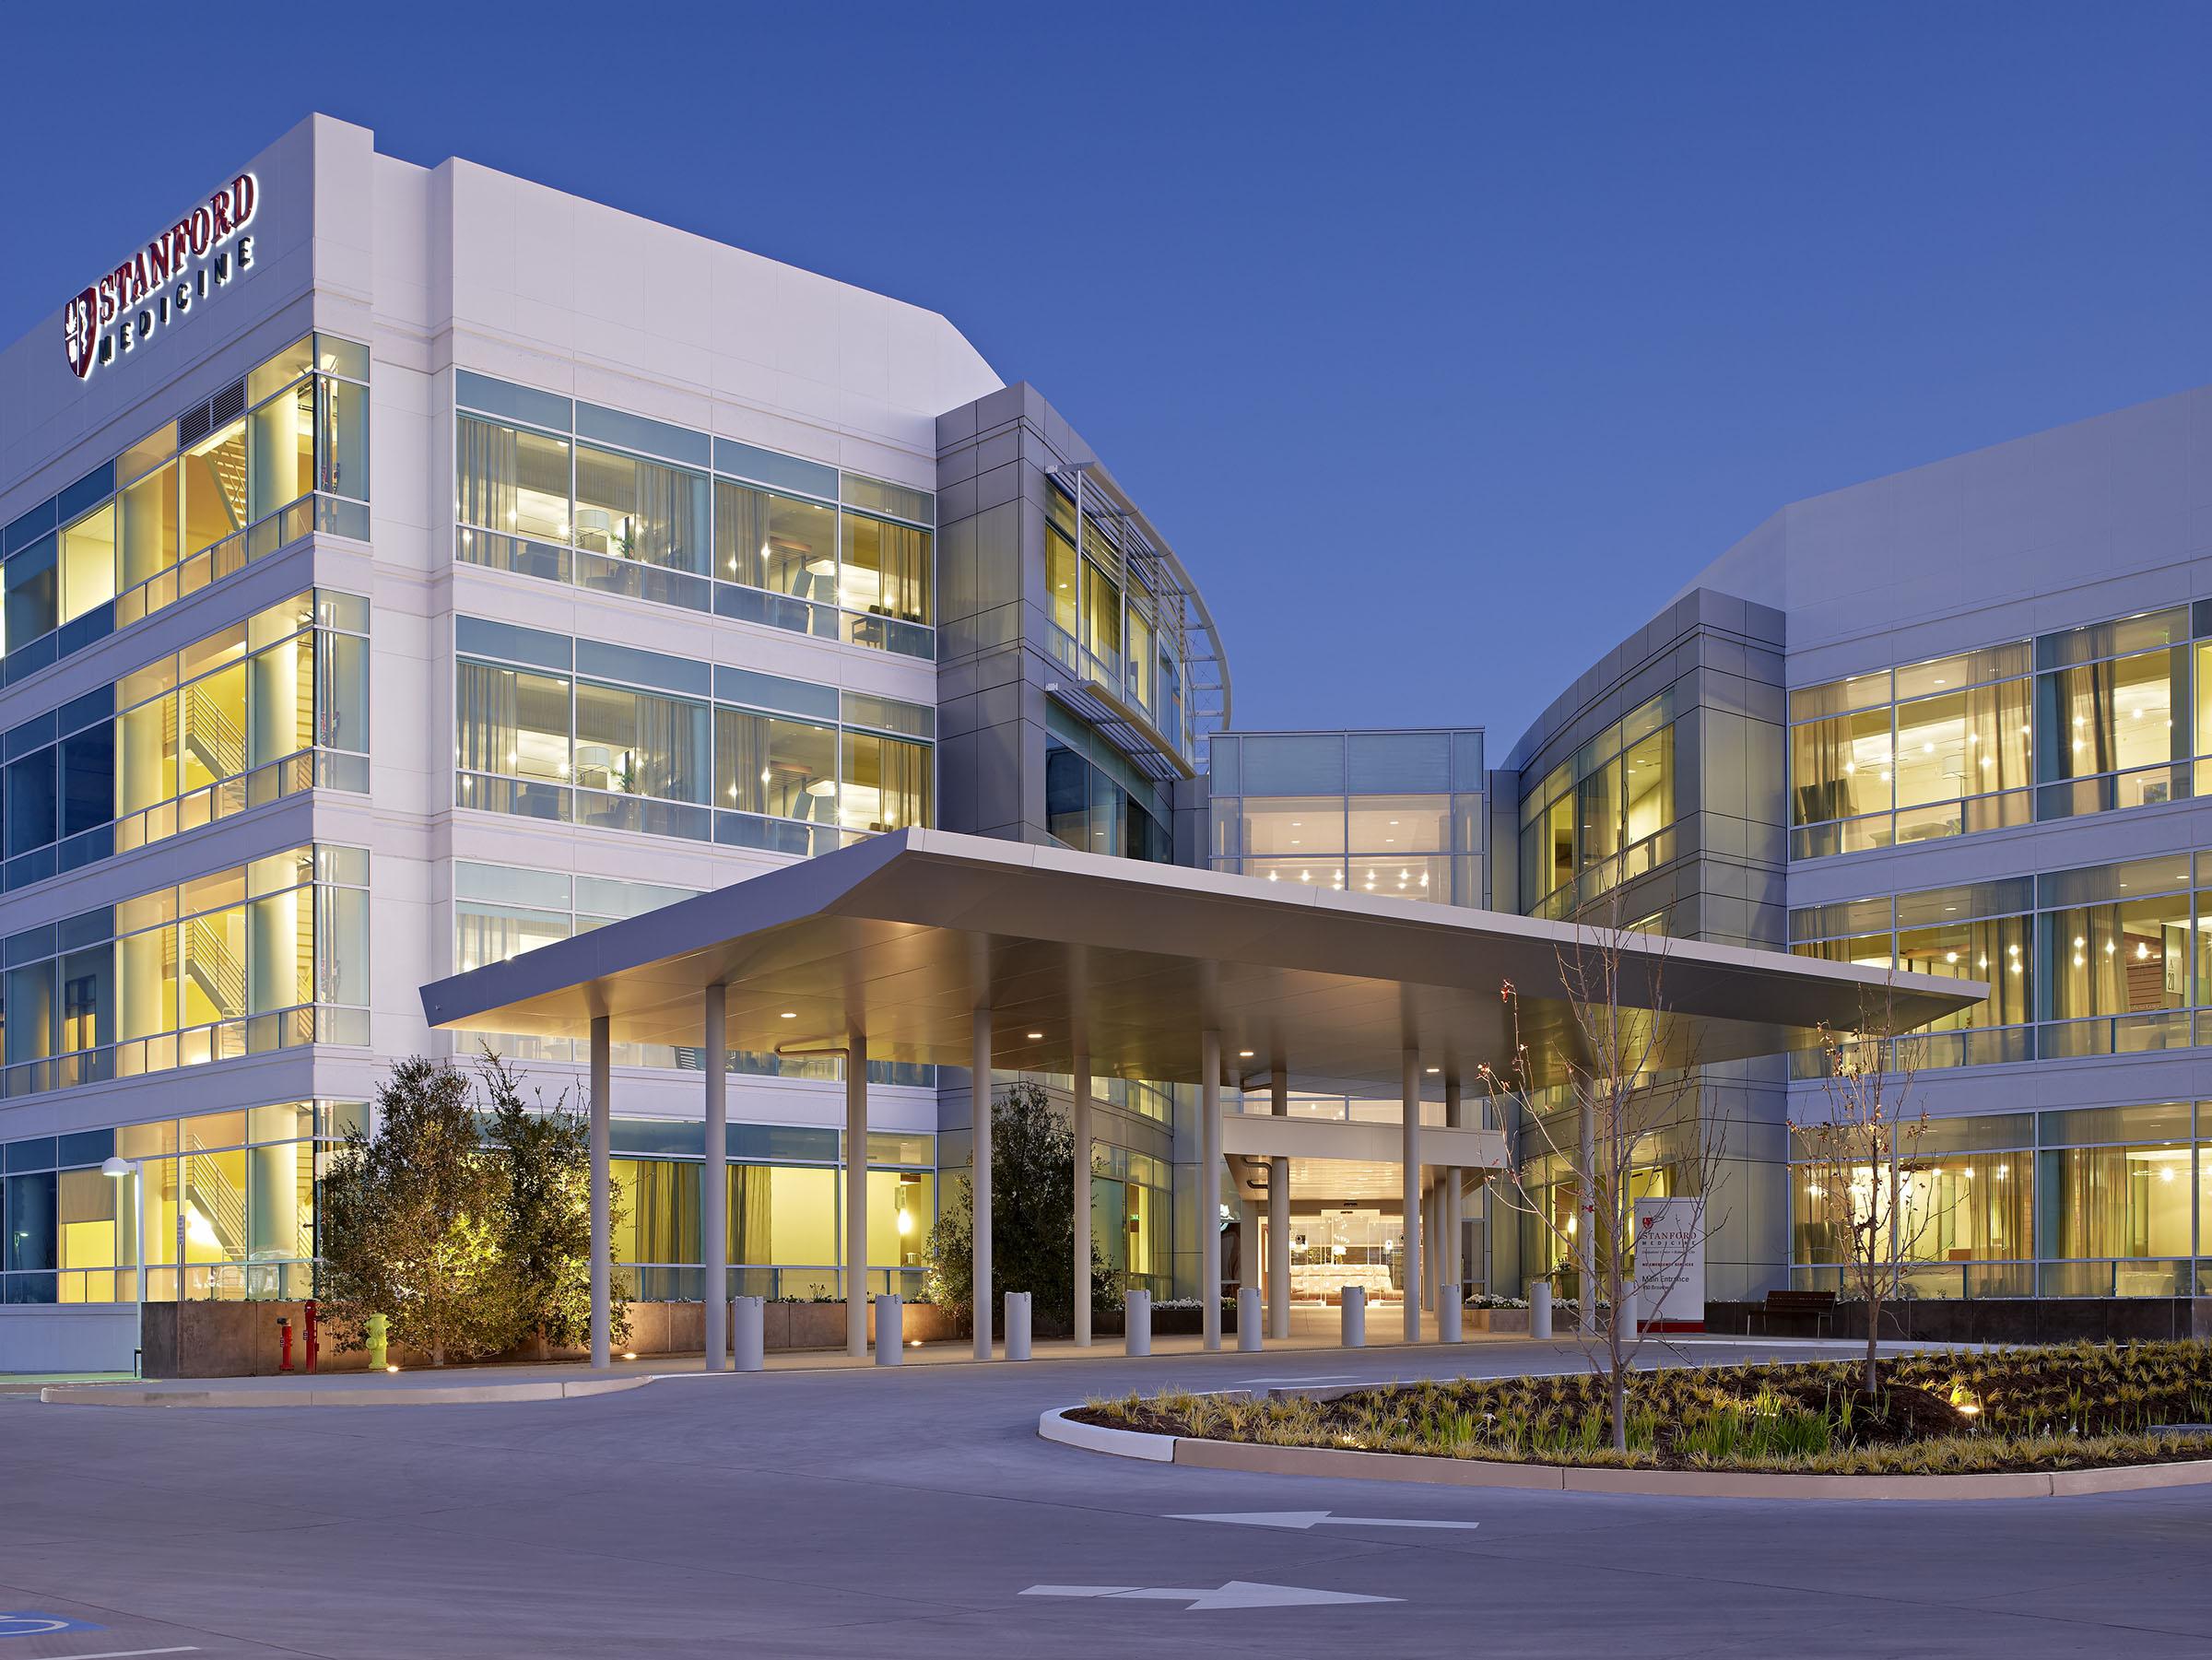 Stanford University Medical Center >> Stanford University Medical Center Paradigm Structural